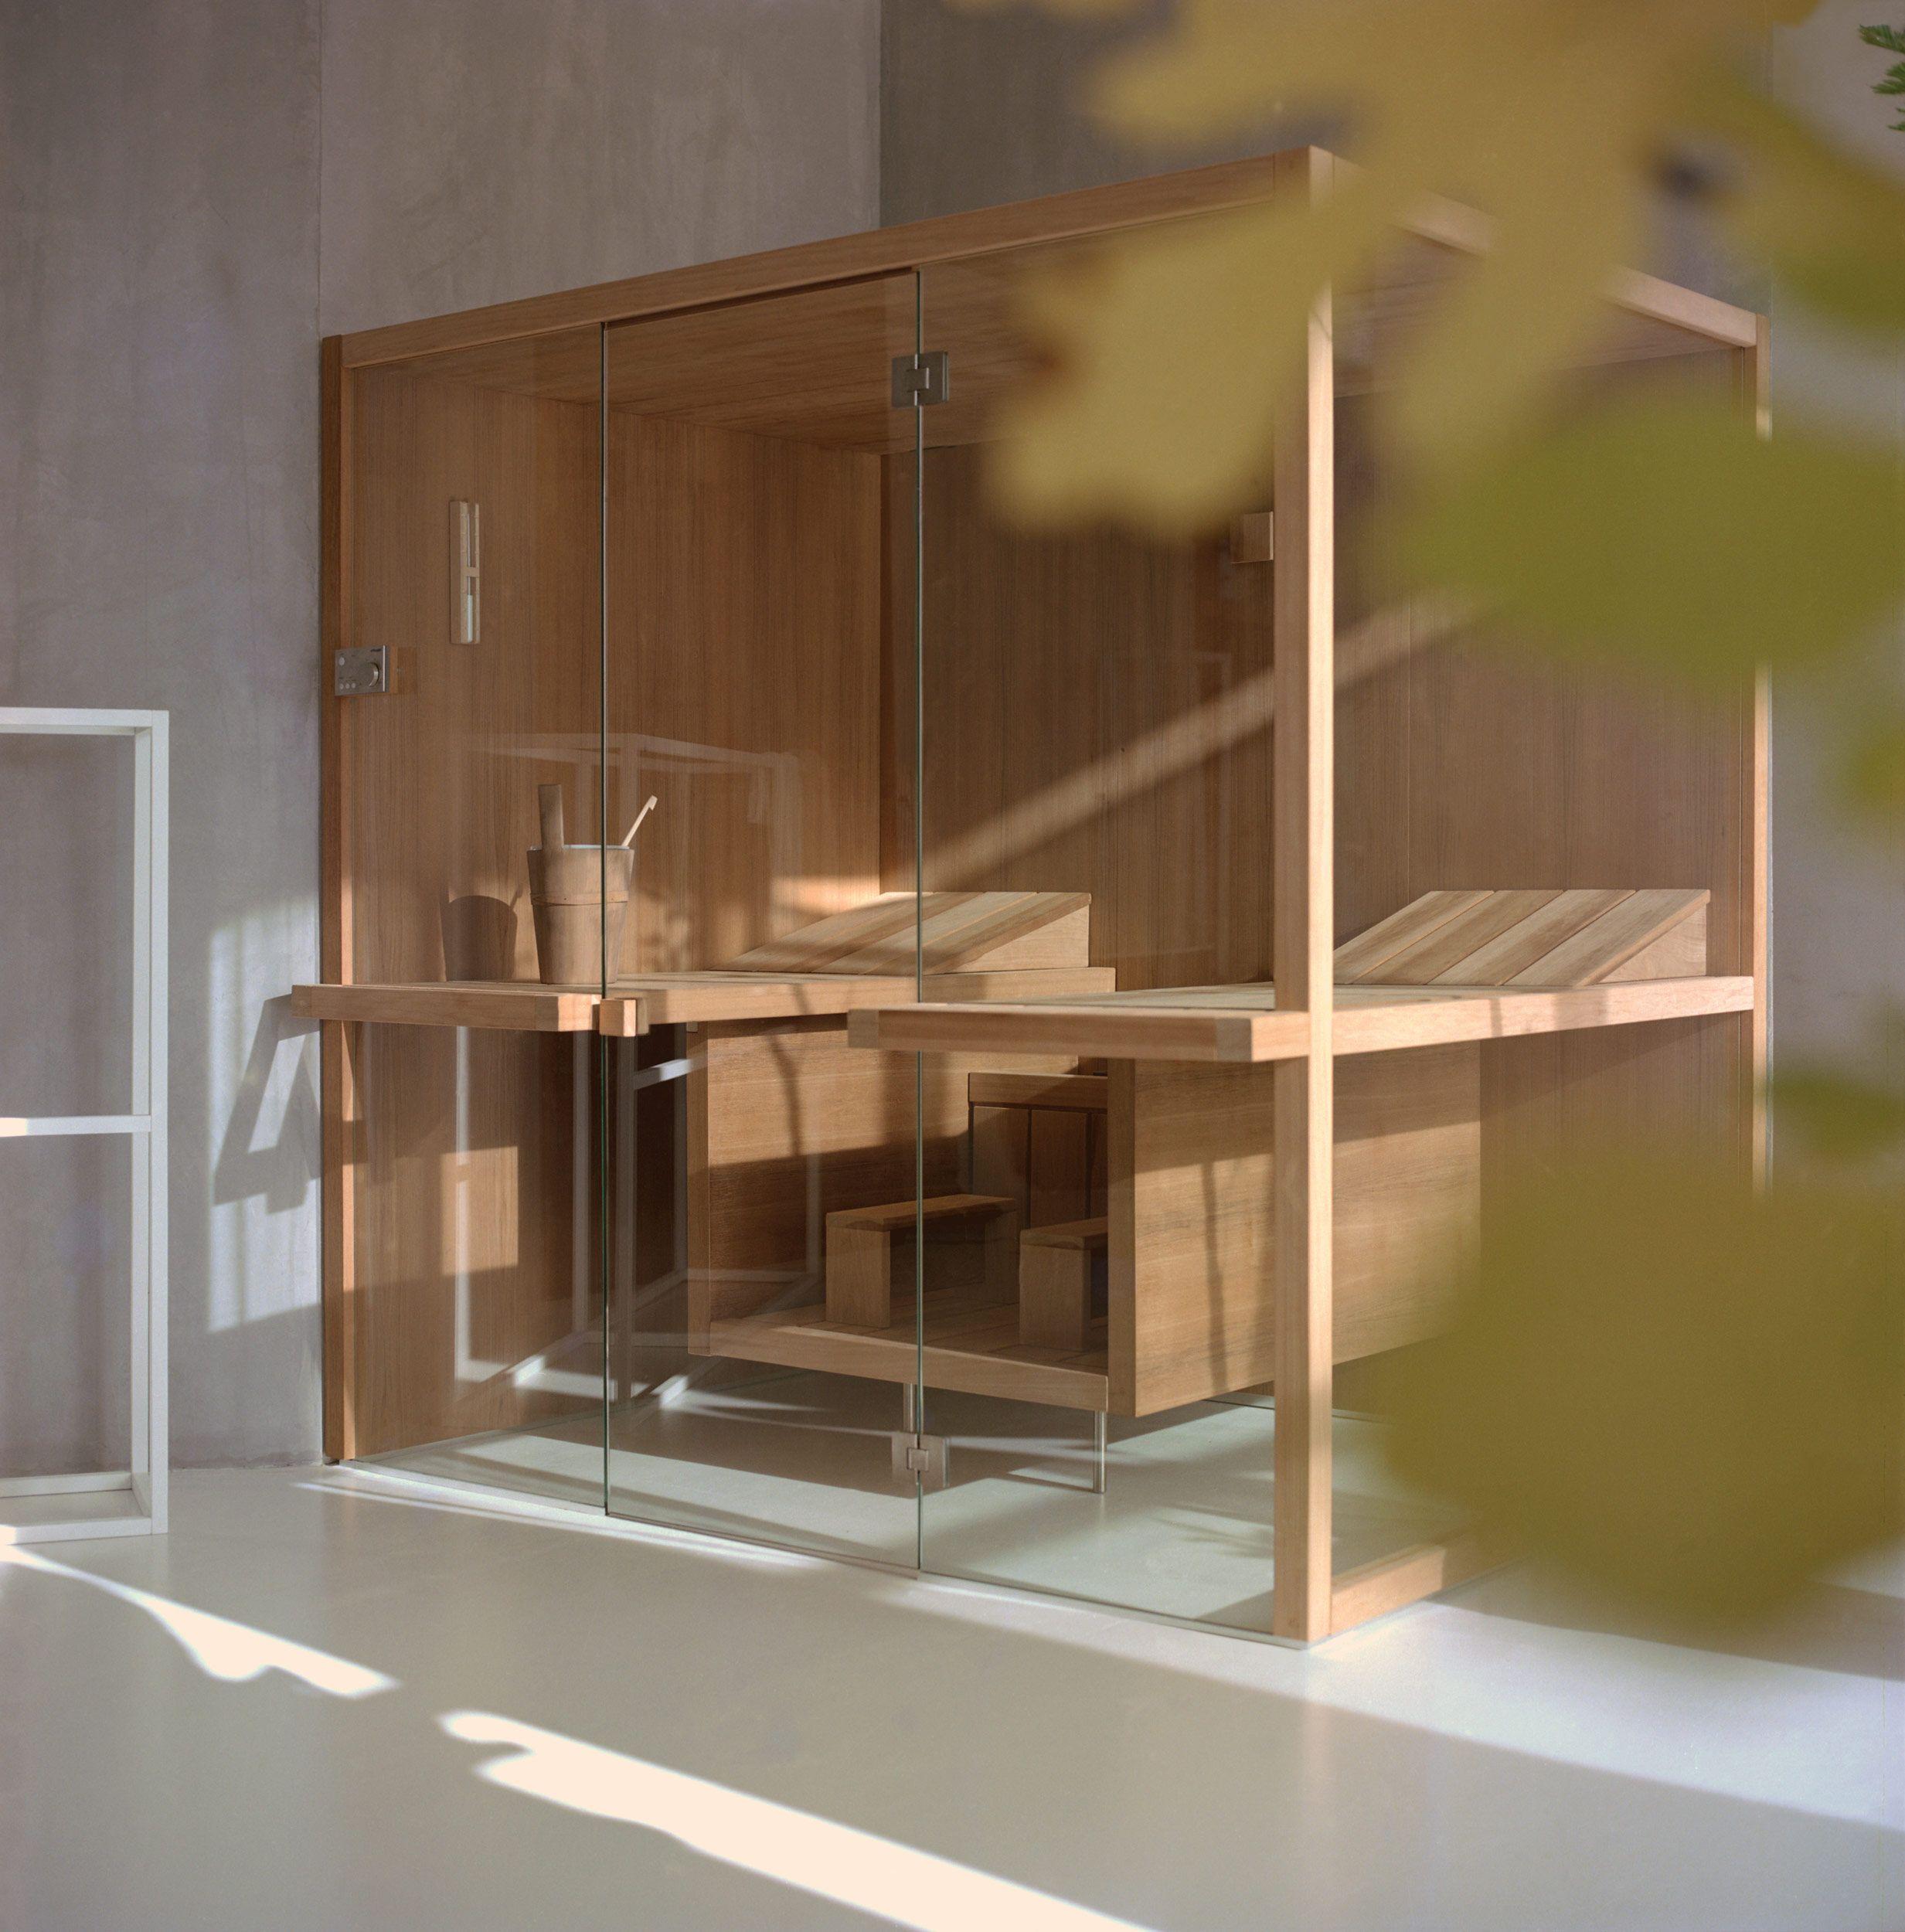 Sauna modern design  Sauna au Design contemporain et original, symétrie des lignes ...